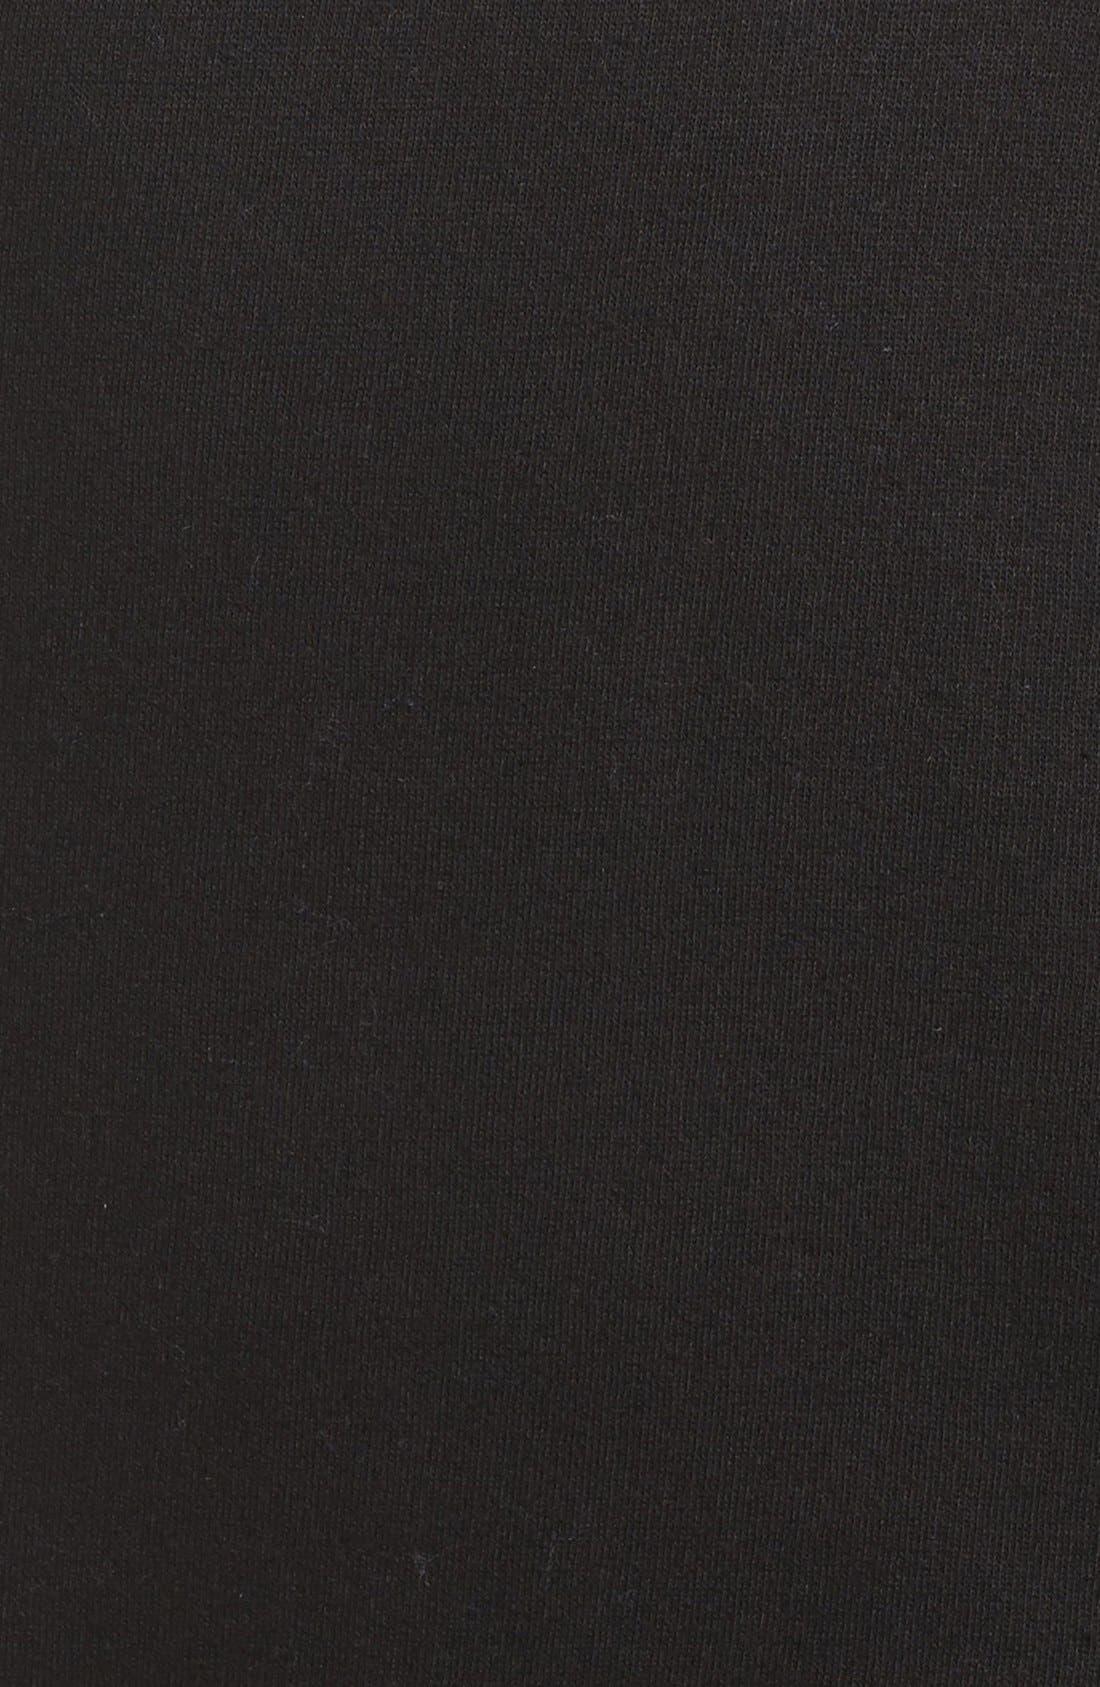 'This Wine' Crewneck Sweatshirt,                             Alternate thumbnail 9, color,                             001